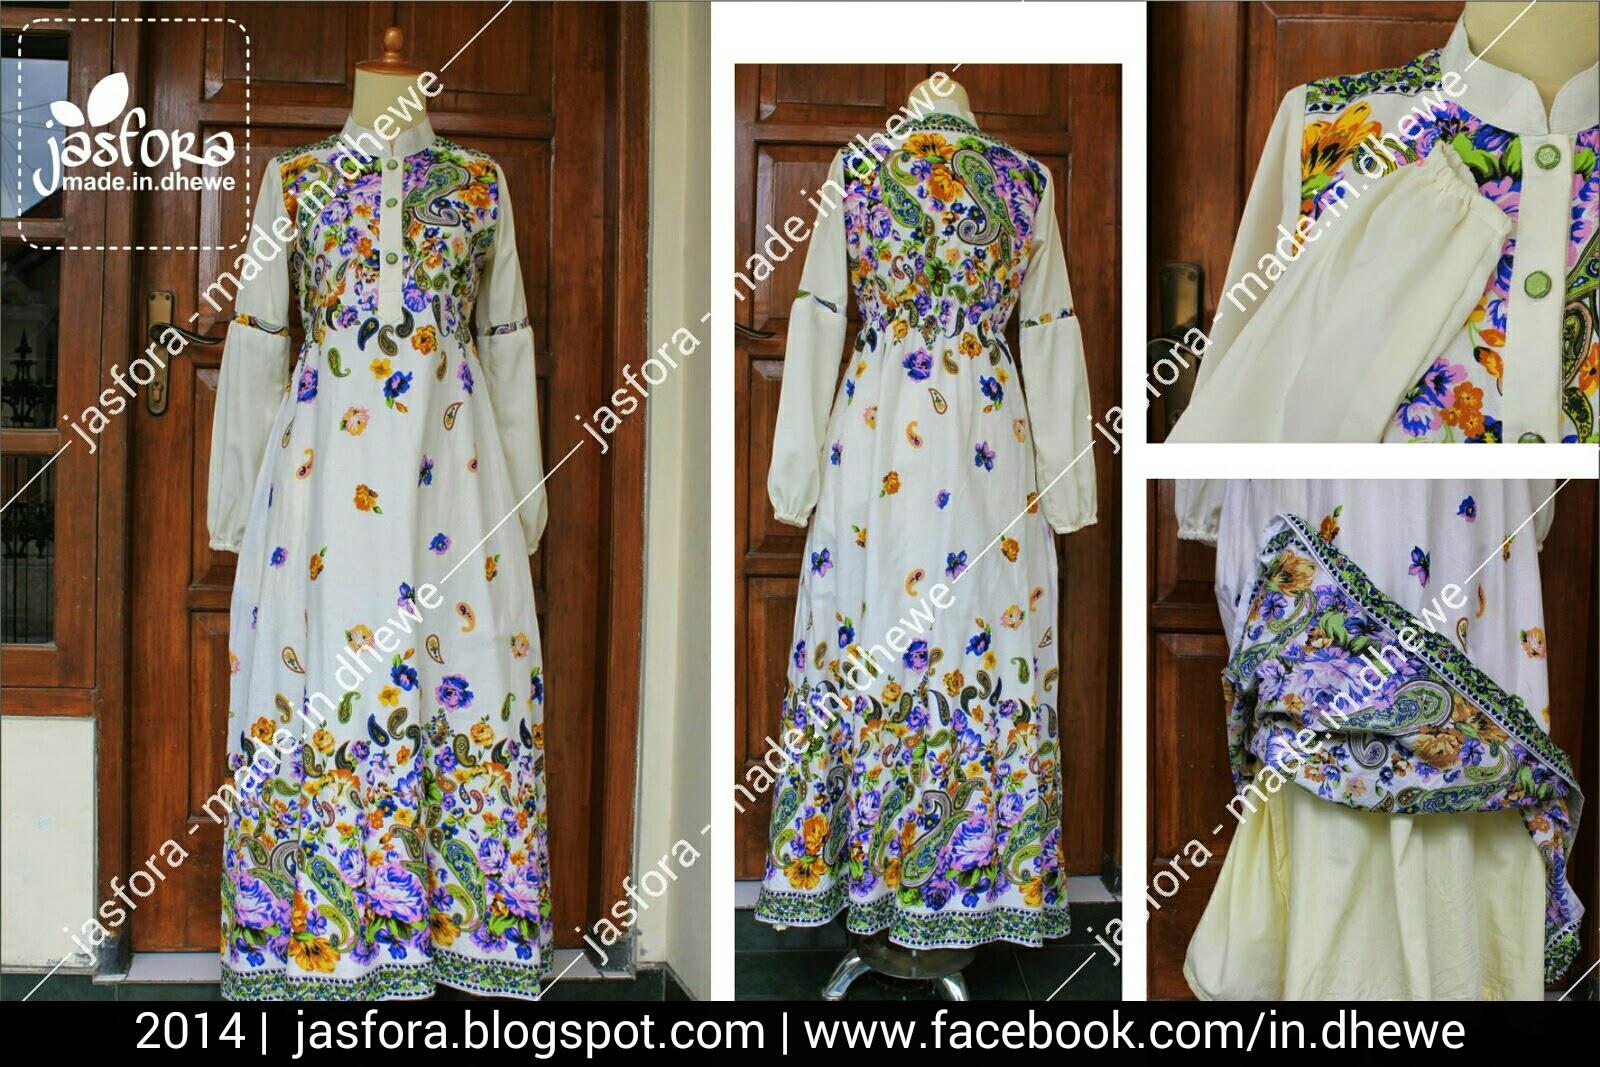 gamis katun motif primissima paisley ungu tumpal putih kombinasi imperial putih tulang, furing katun ero kuning muda